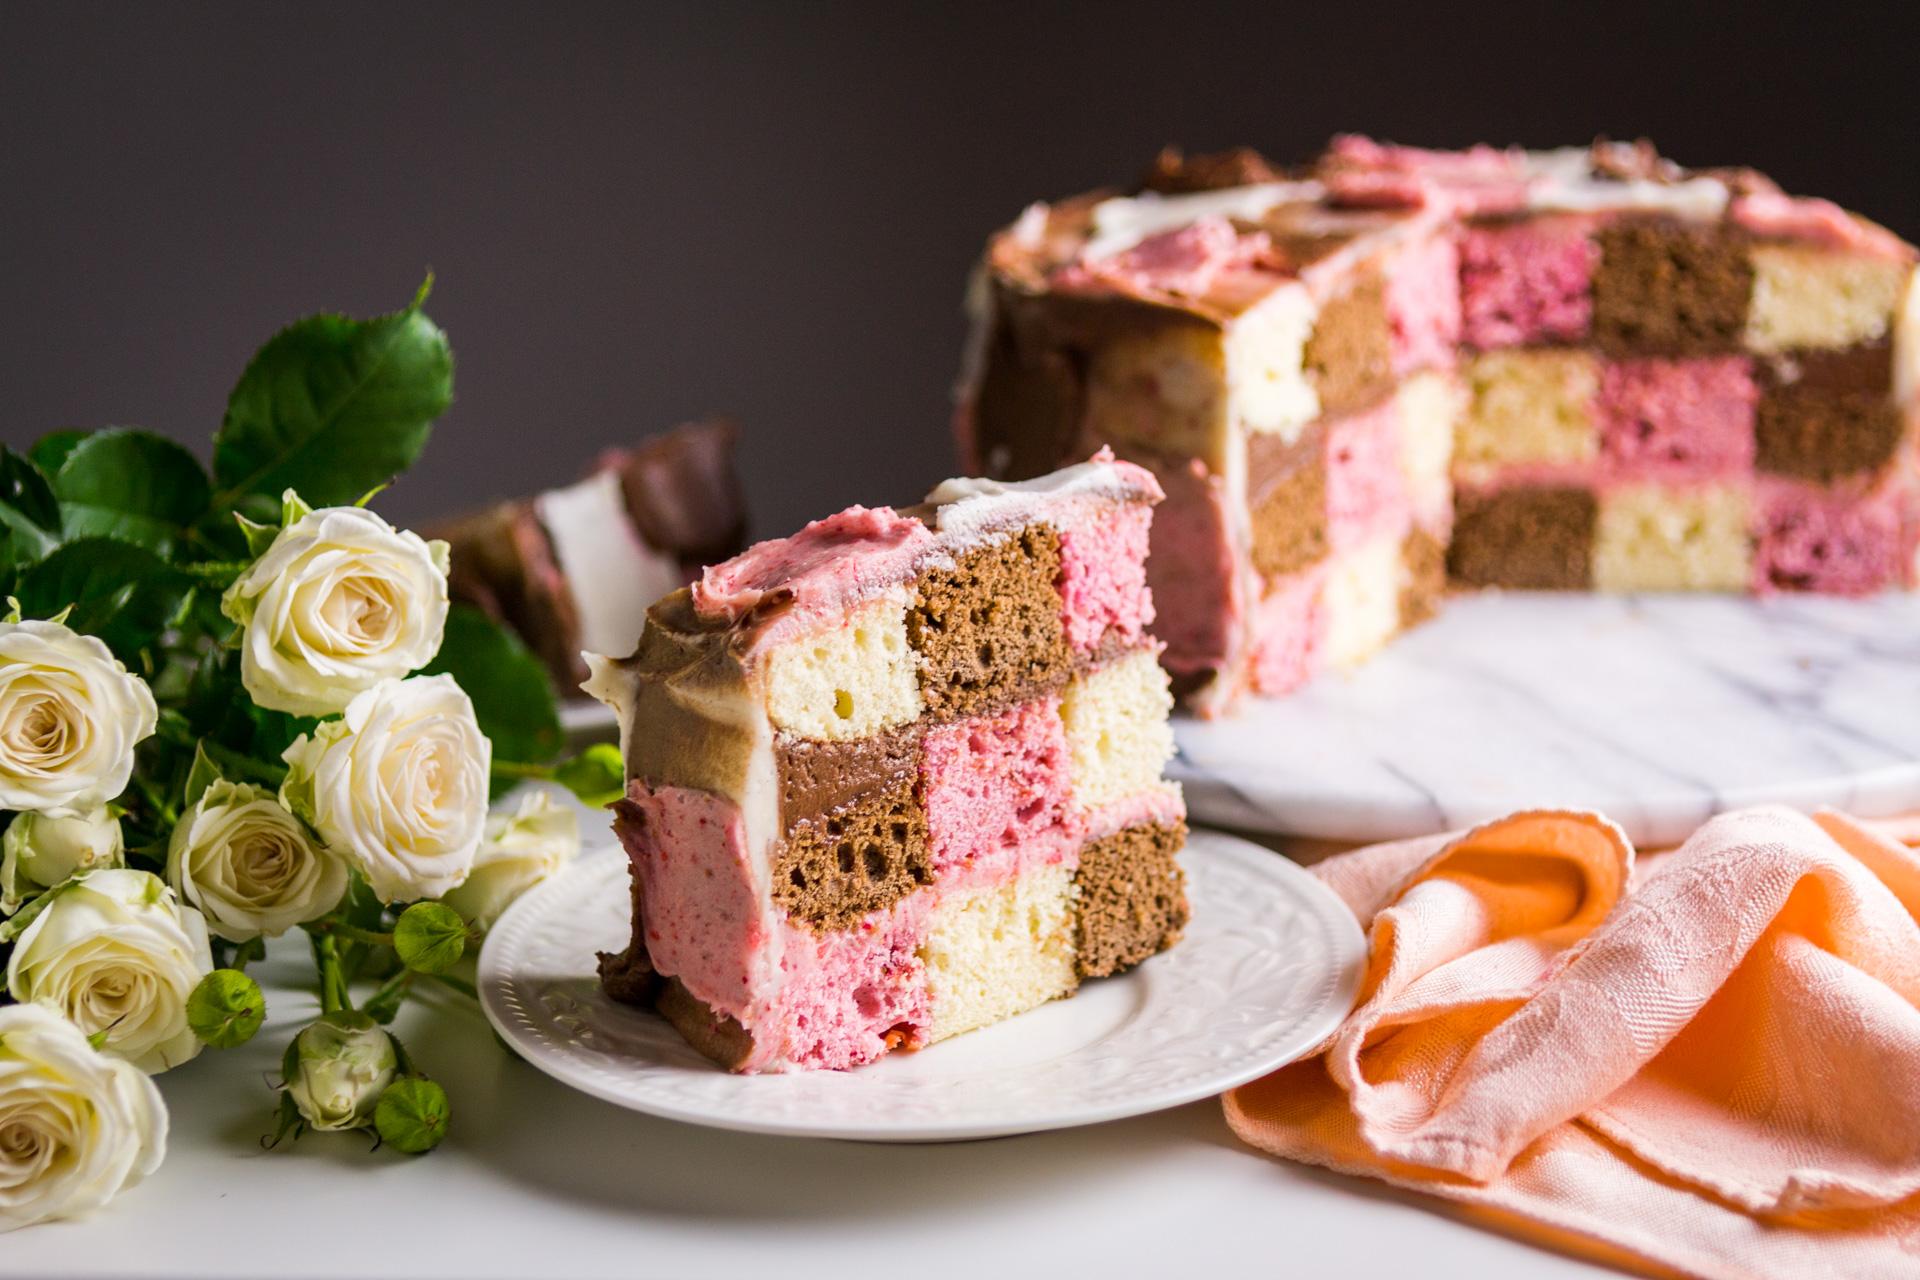 neapolitan-checkered-cake-14.jpg